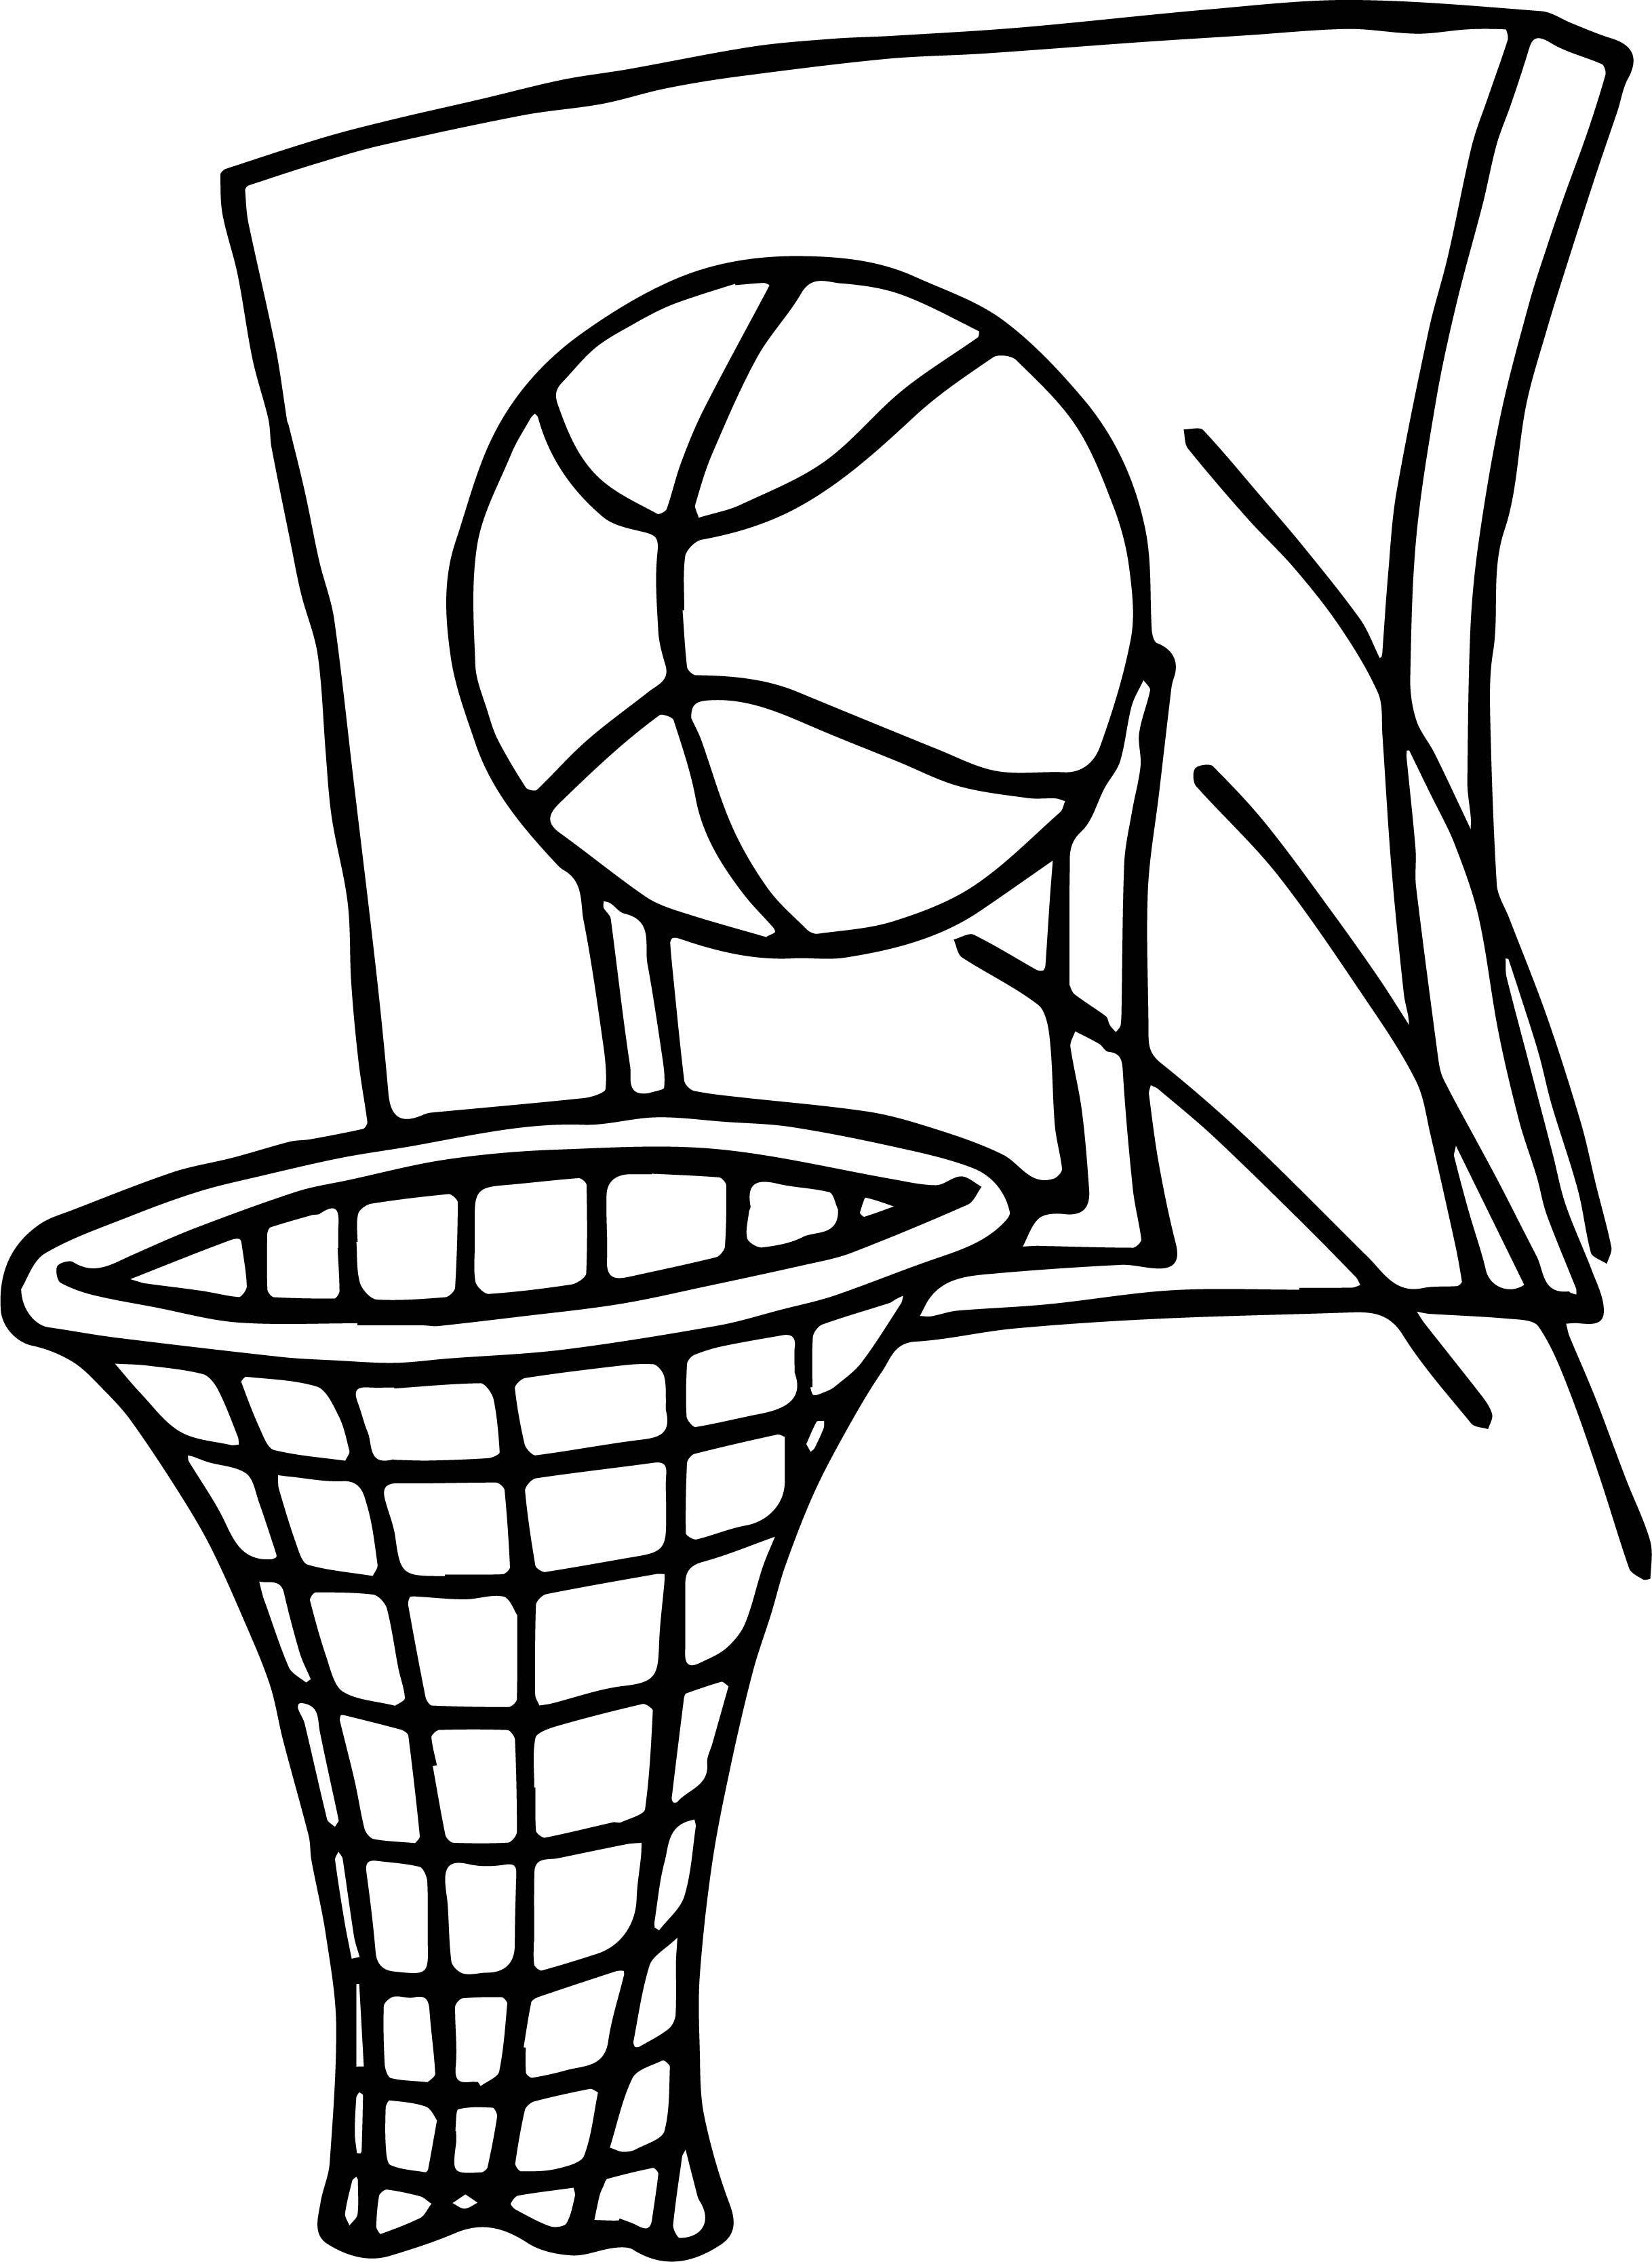 Cool Ball Shot Playing Basketball Coloring Page